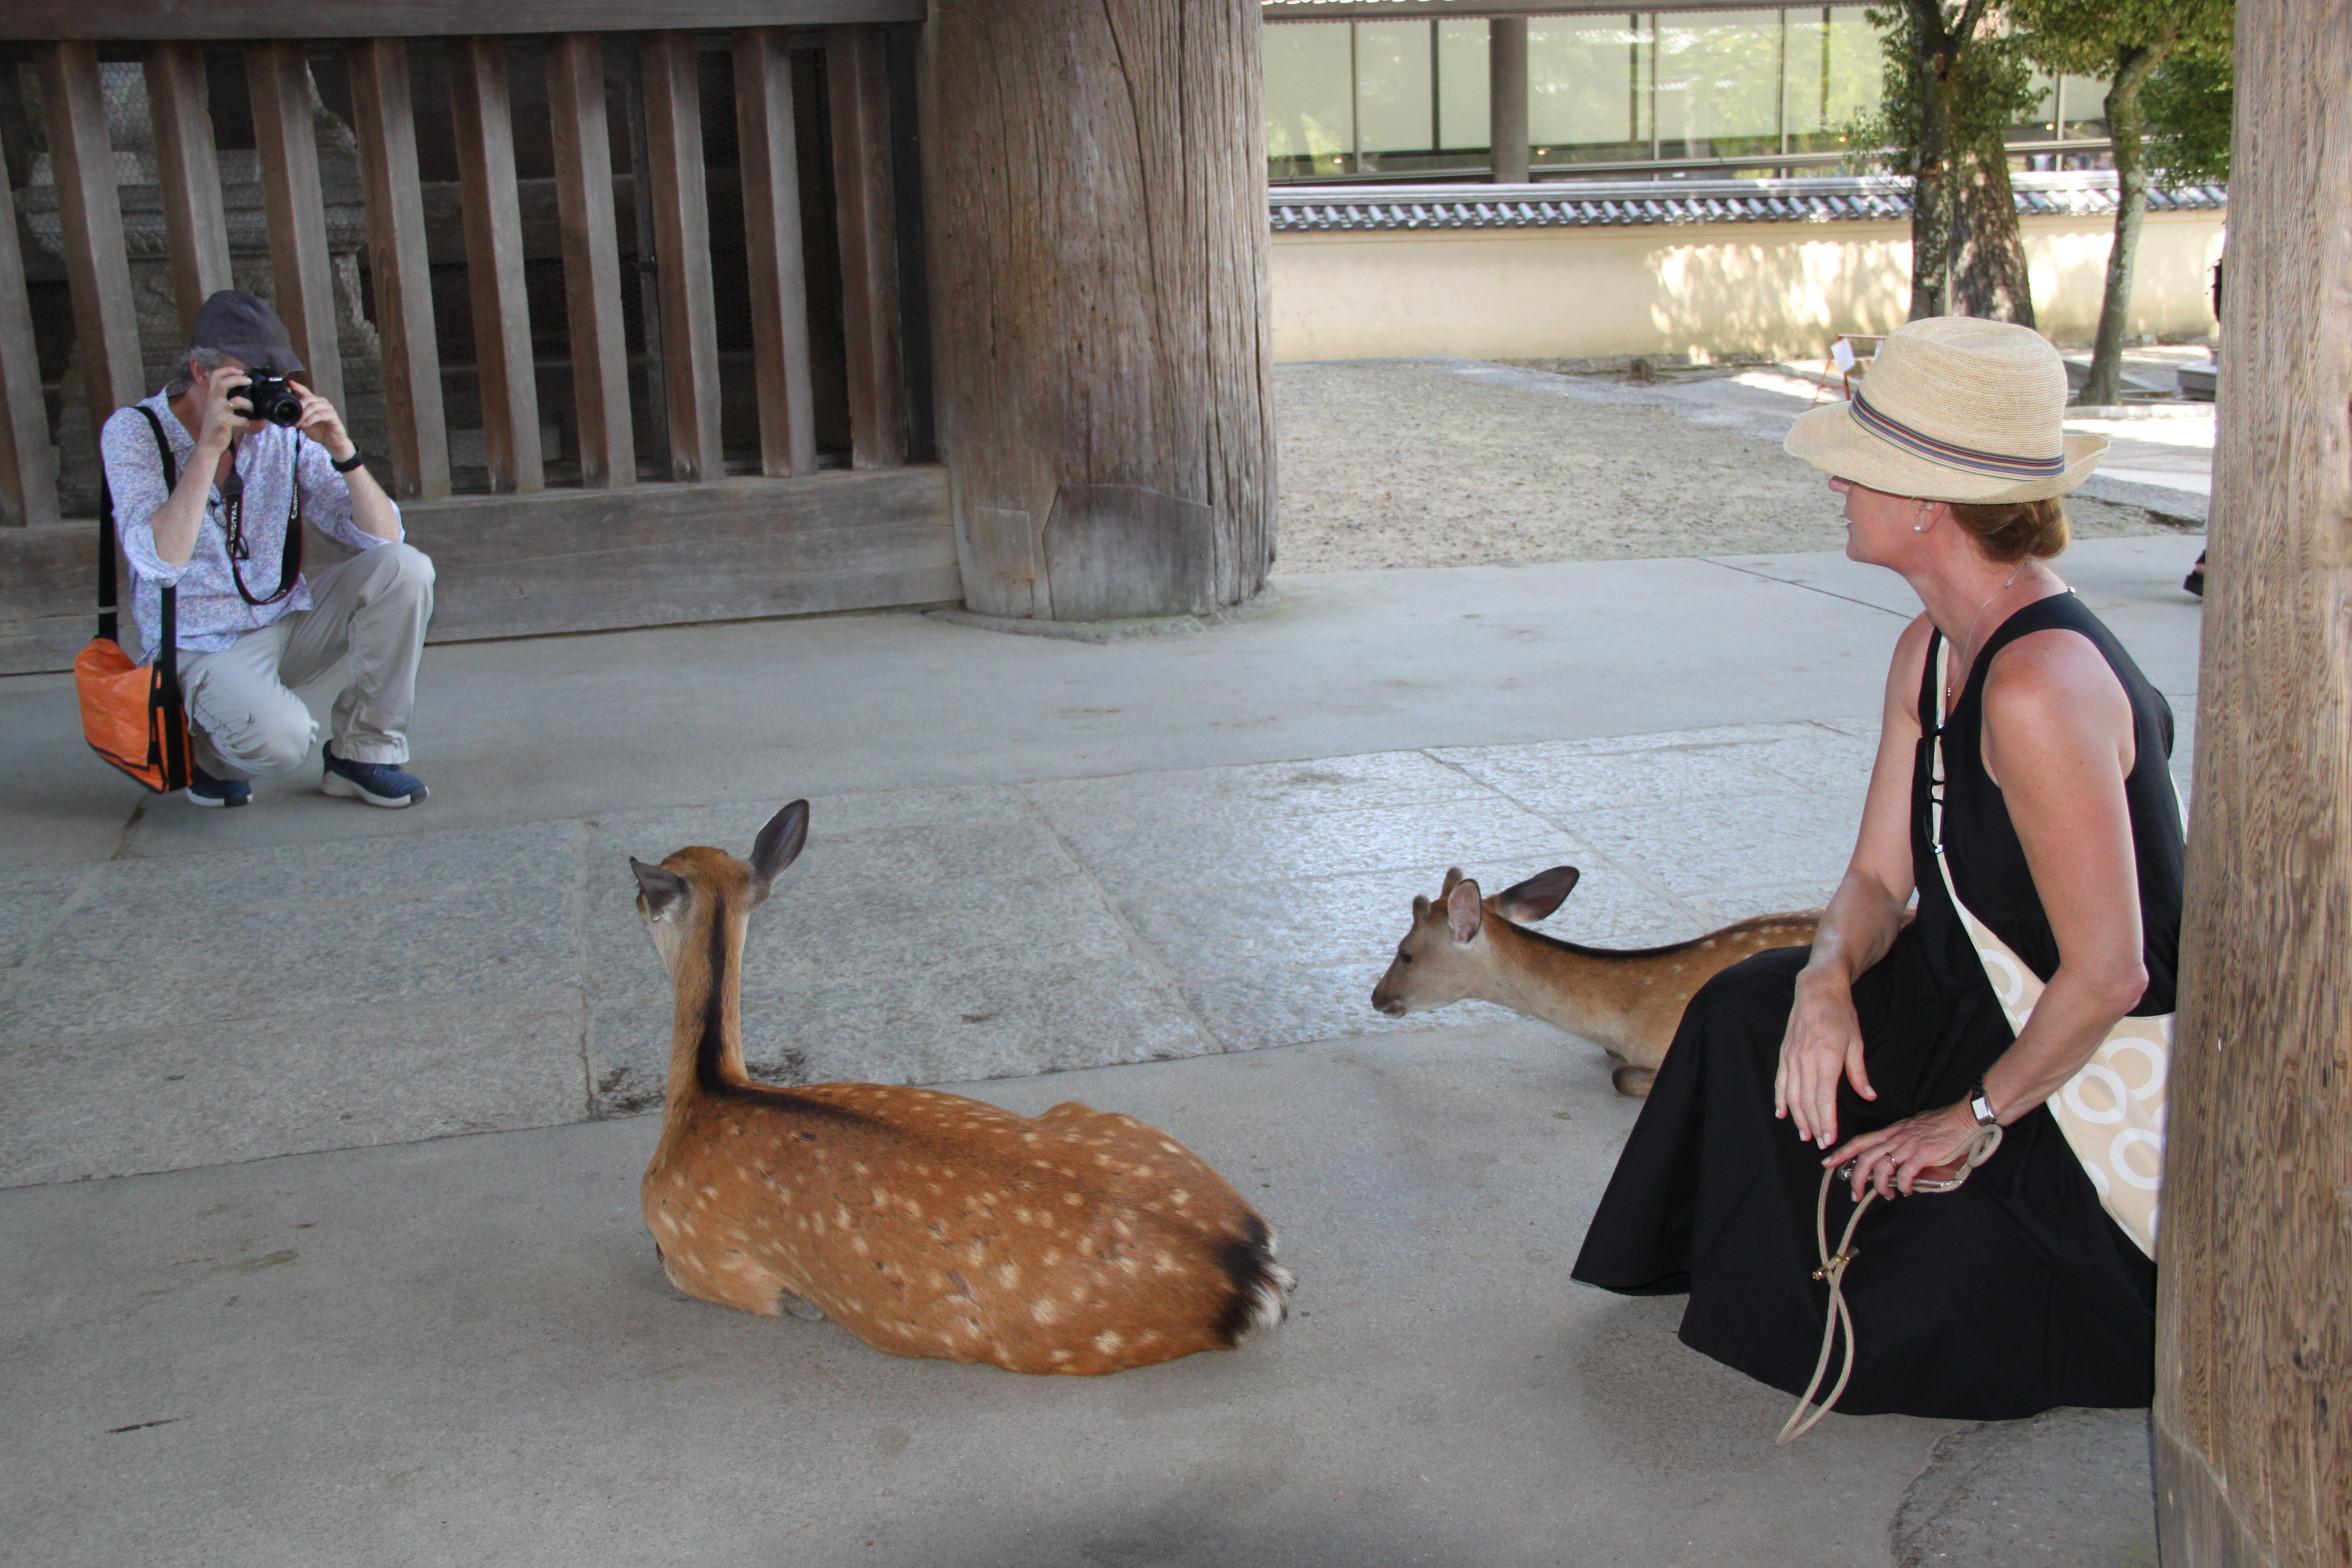 Japan Zen Reise Nara-Temple Beate Aldag Ulrich Halstenbach